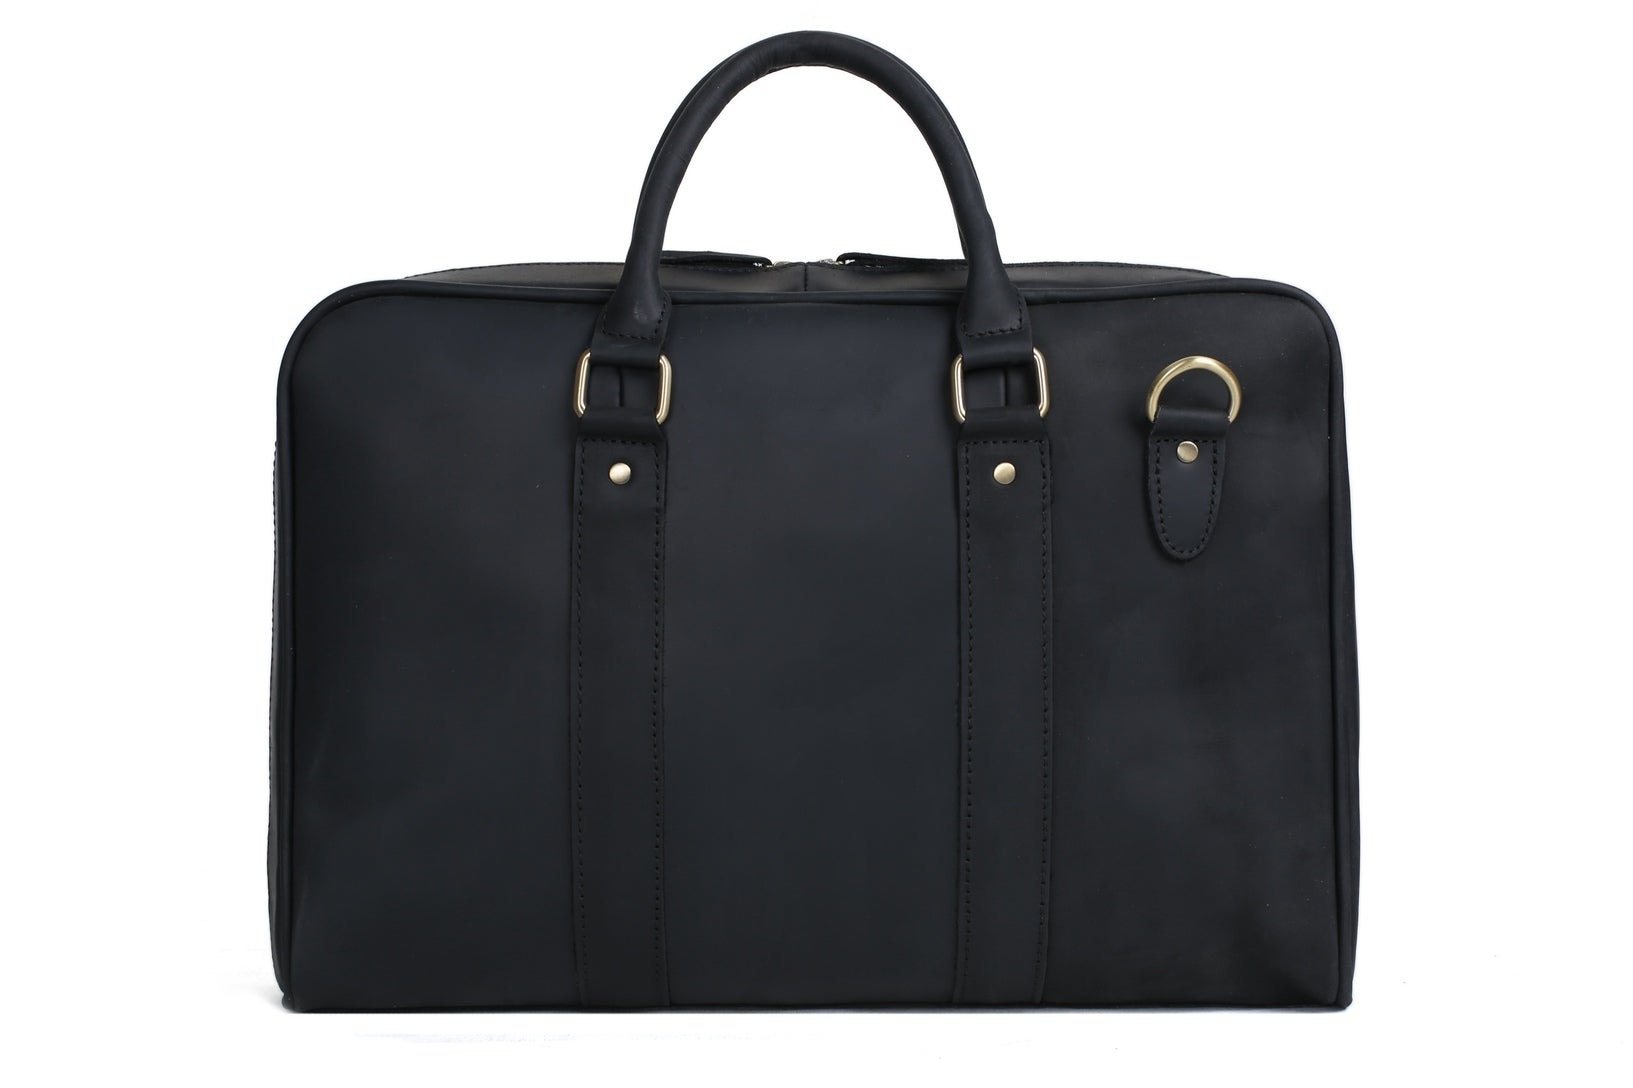 MoshiLeatherBag - Handmade Leather Bag Manufacturer — Handmade Black  Genuine Leather Briefcase 4a3babc8512e1